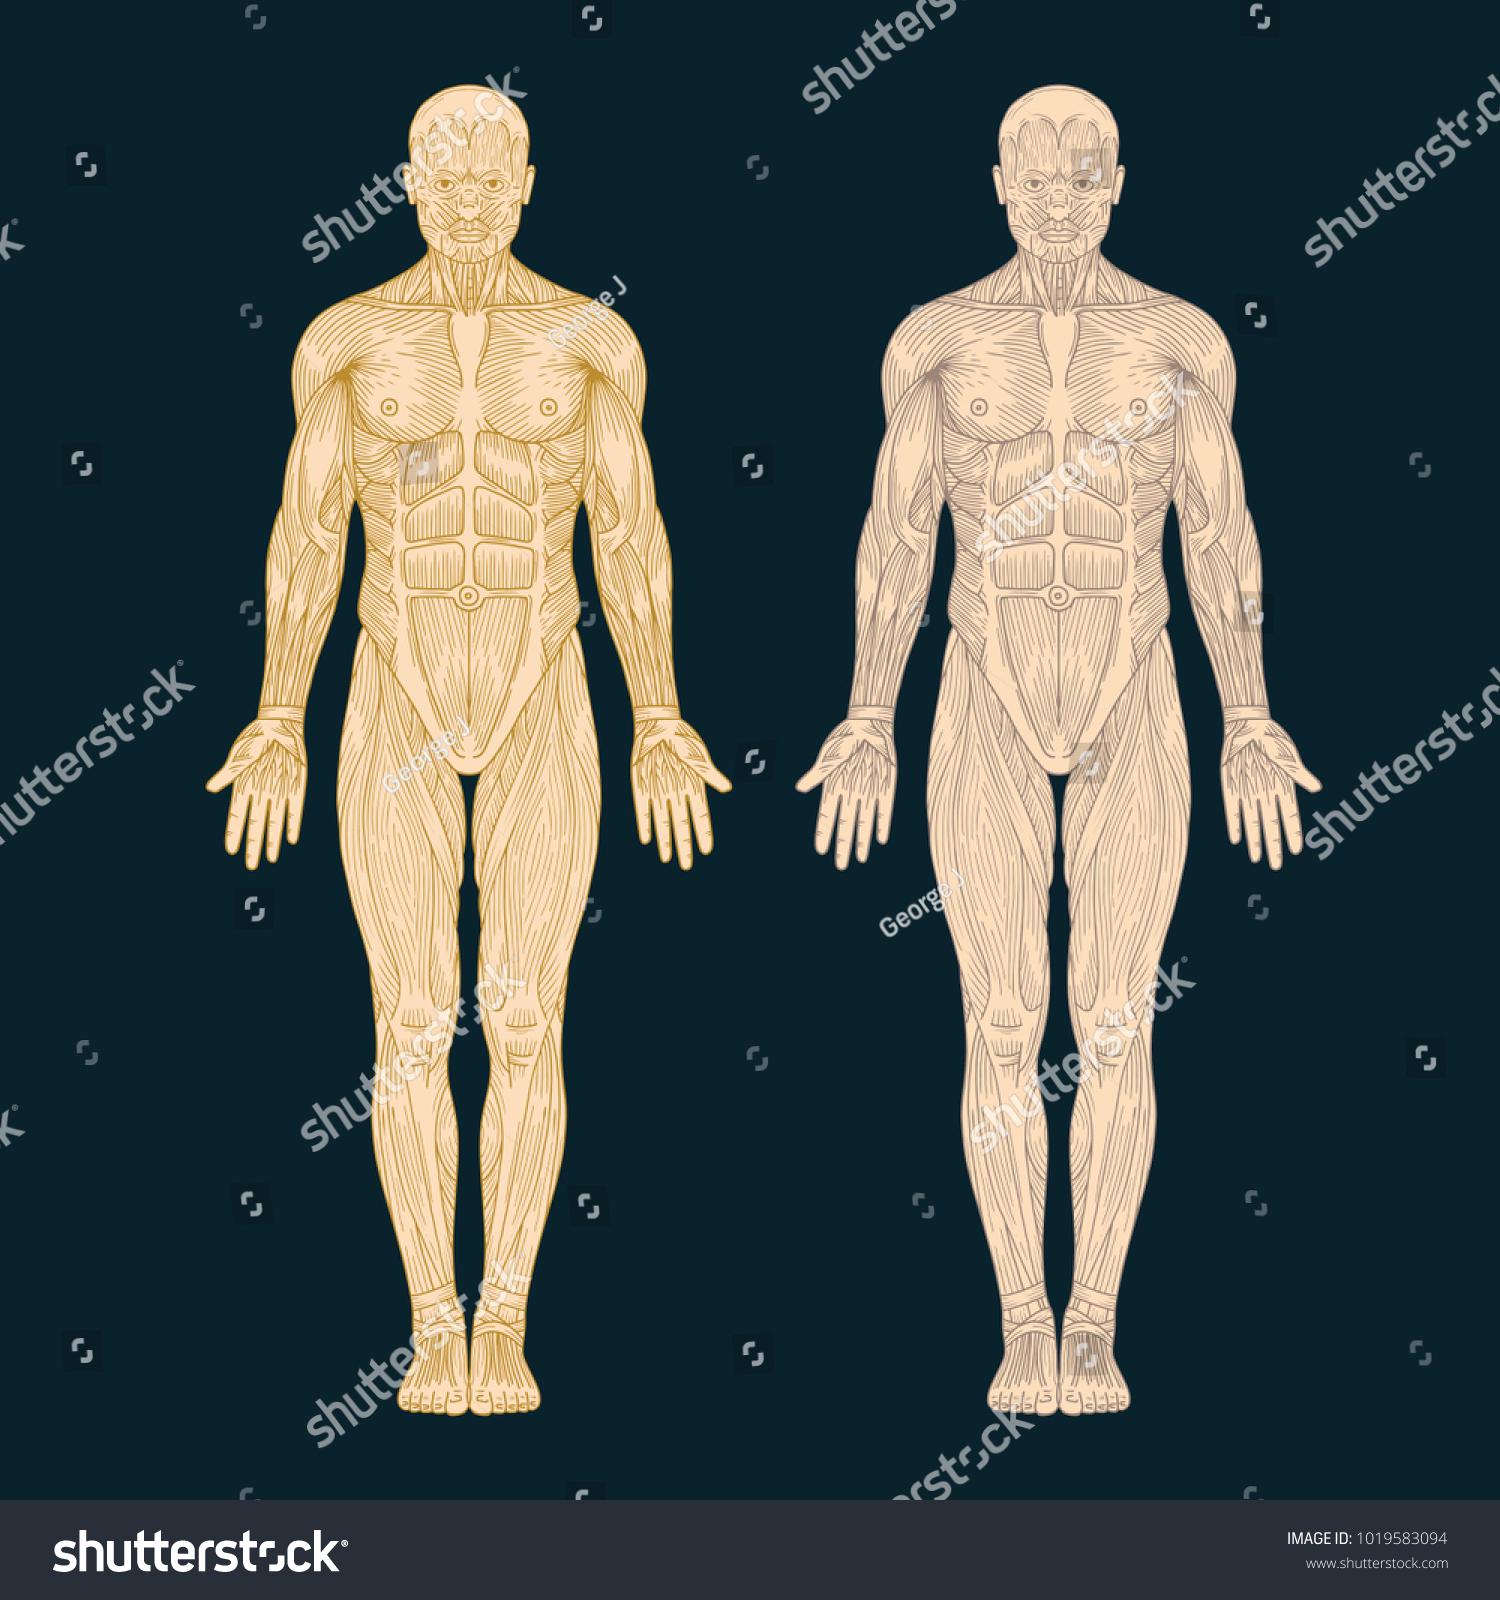 Hand Drawn Human Anatomy Illustration Muscles Vector de ...